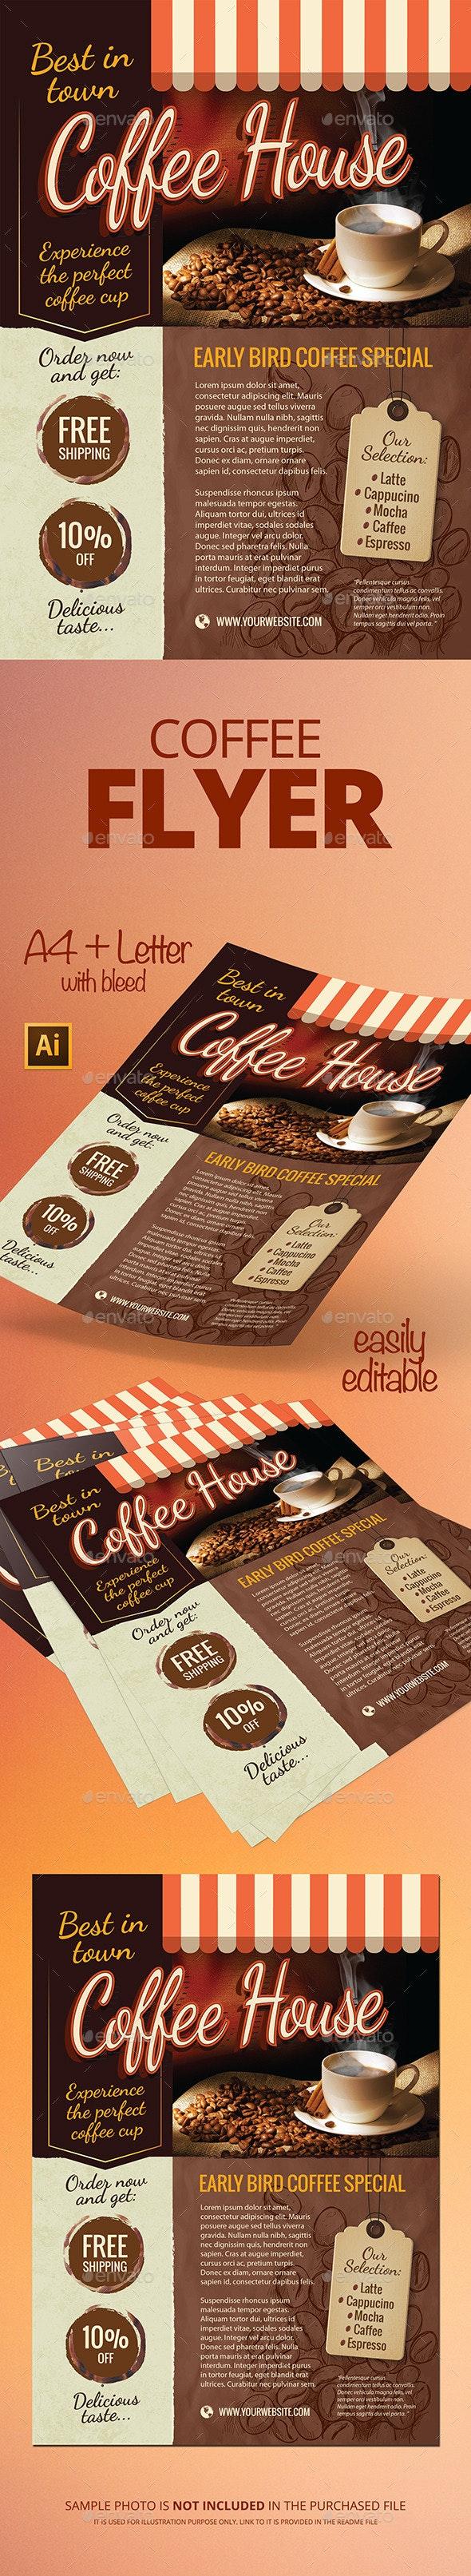 Coffee Flyer - Restaurant Flyers